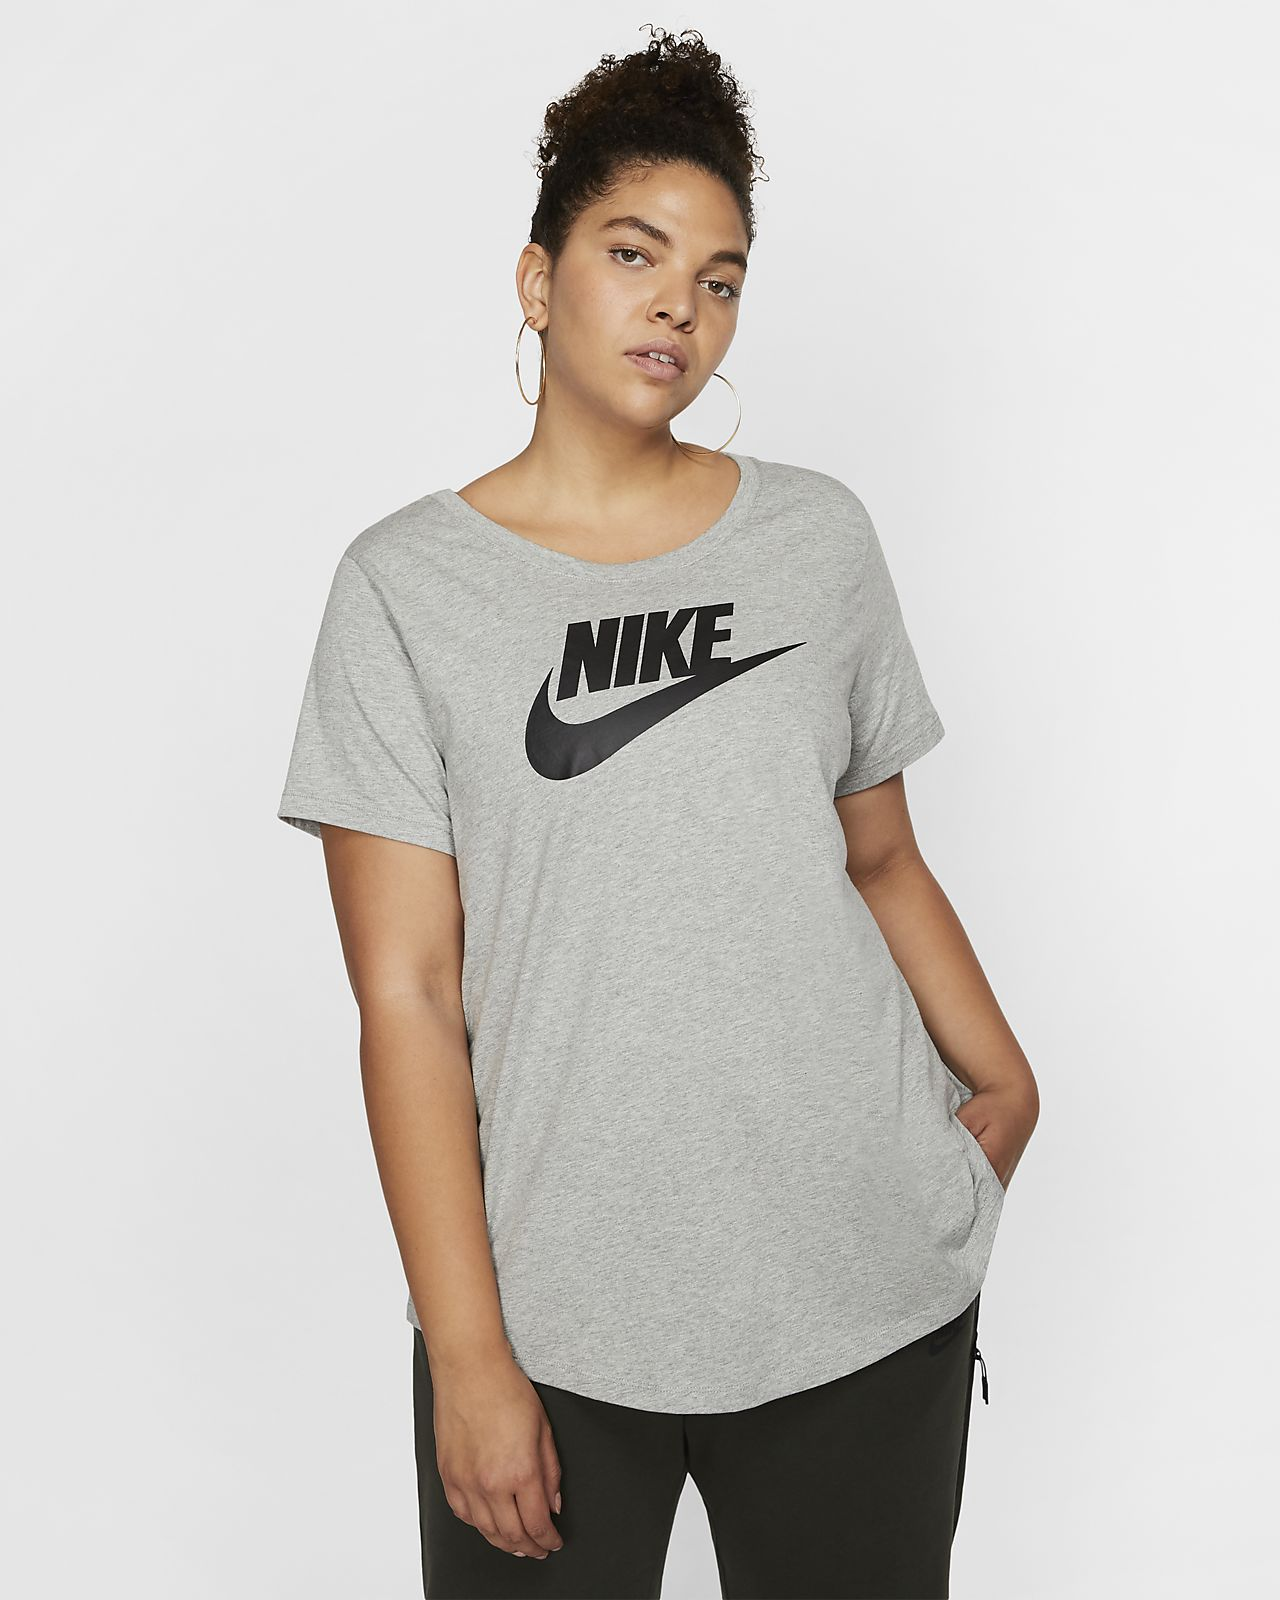 Tee-shirt Nike Sportswear Essential pour Femme (grande taille)